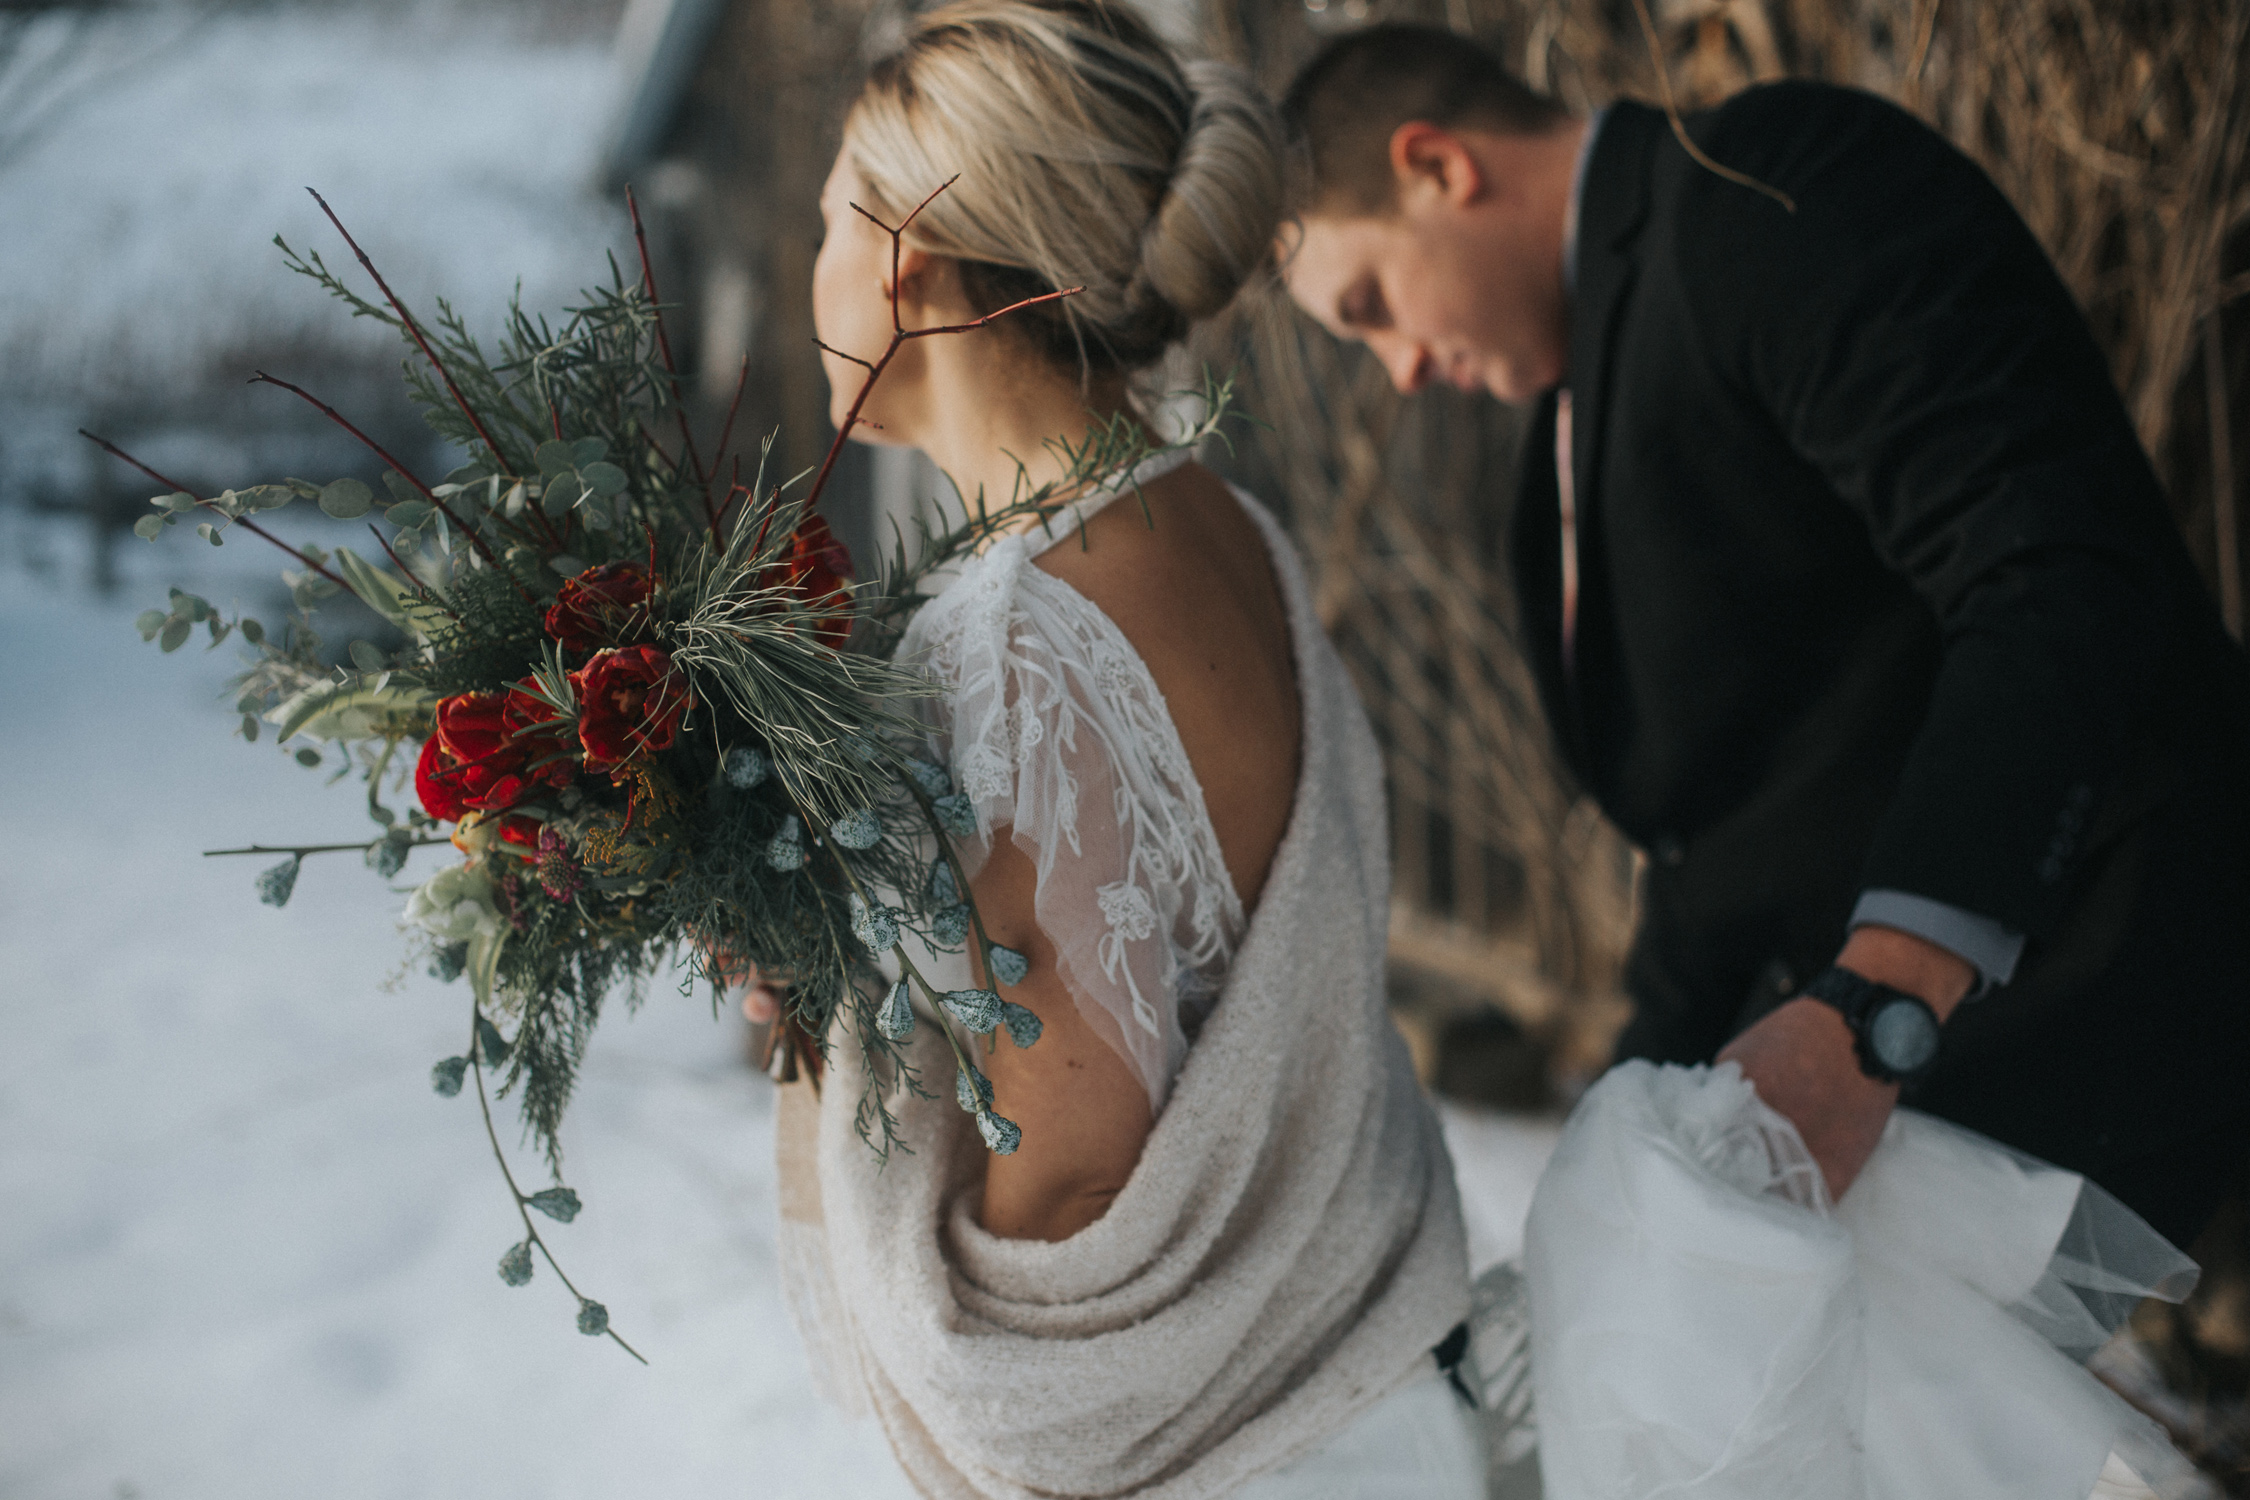 mnd_farm_winter_wedding_002.jpg